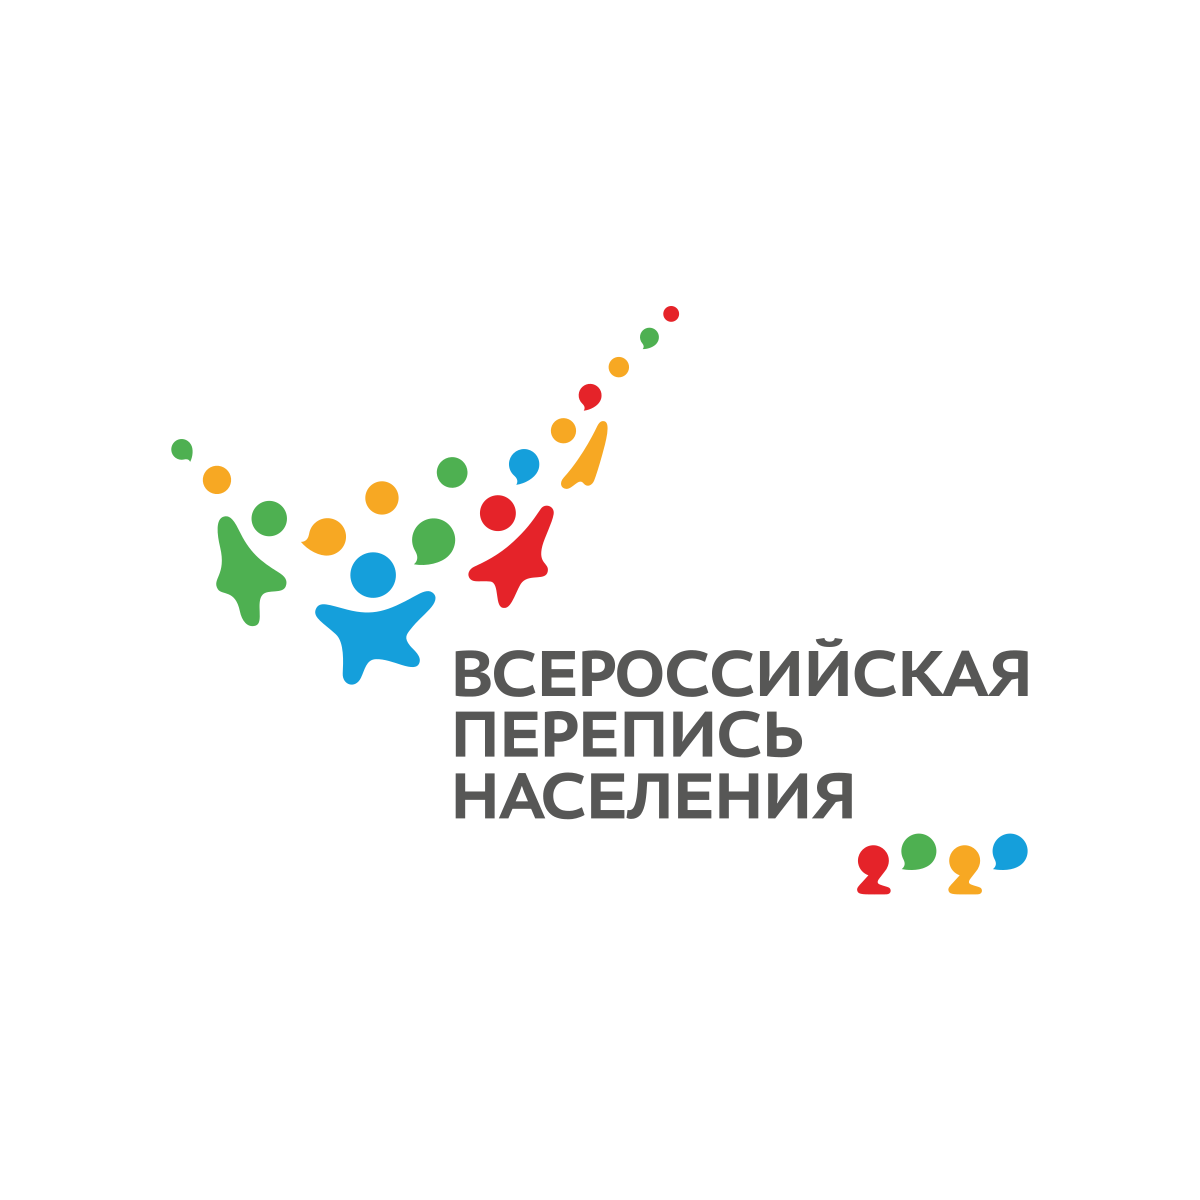 Татарстанстат: 70% переписчиков перед ВПН прошли вакцинацию от Covid-19